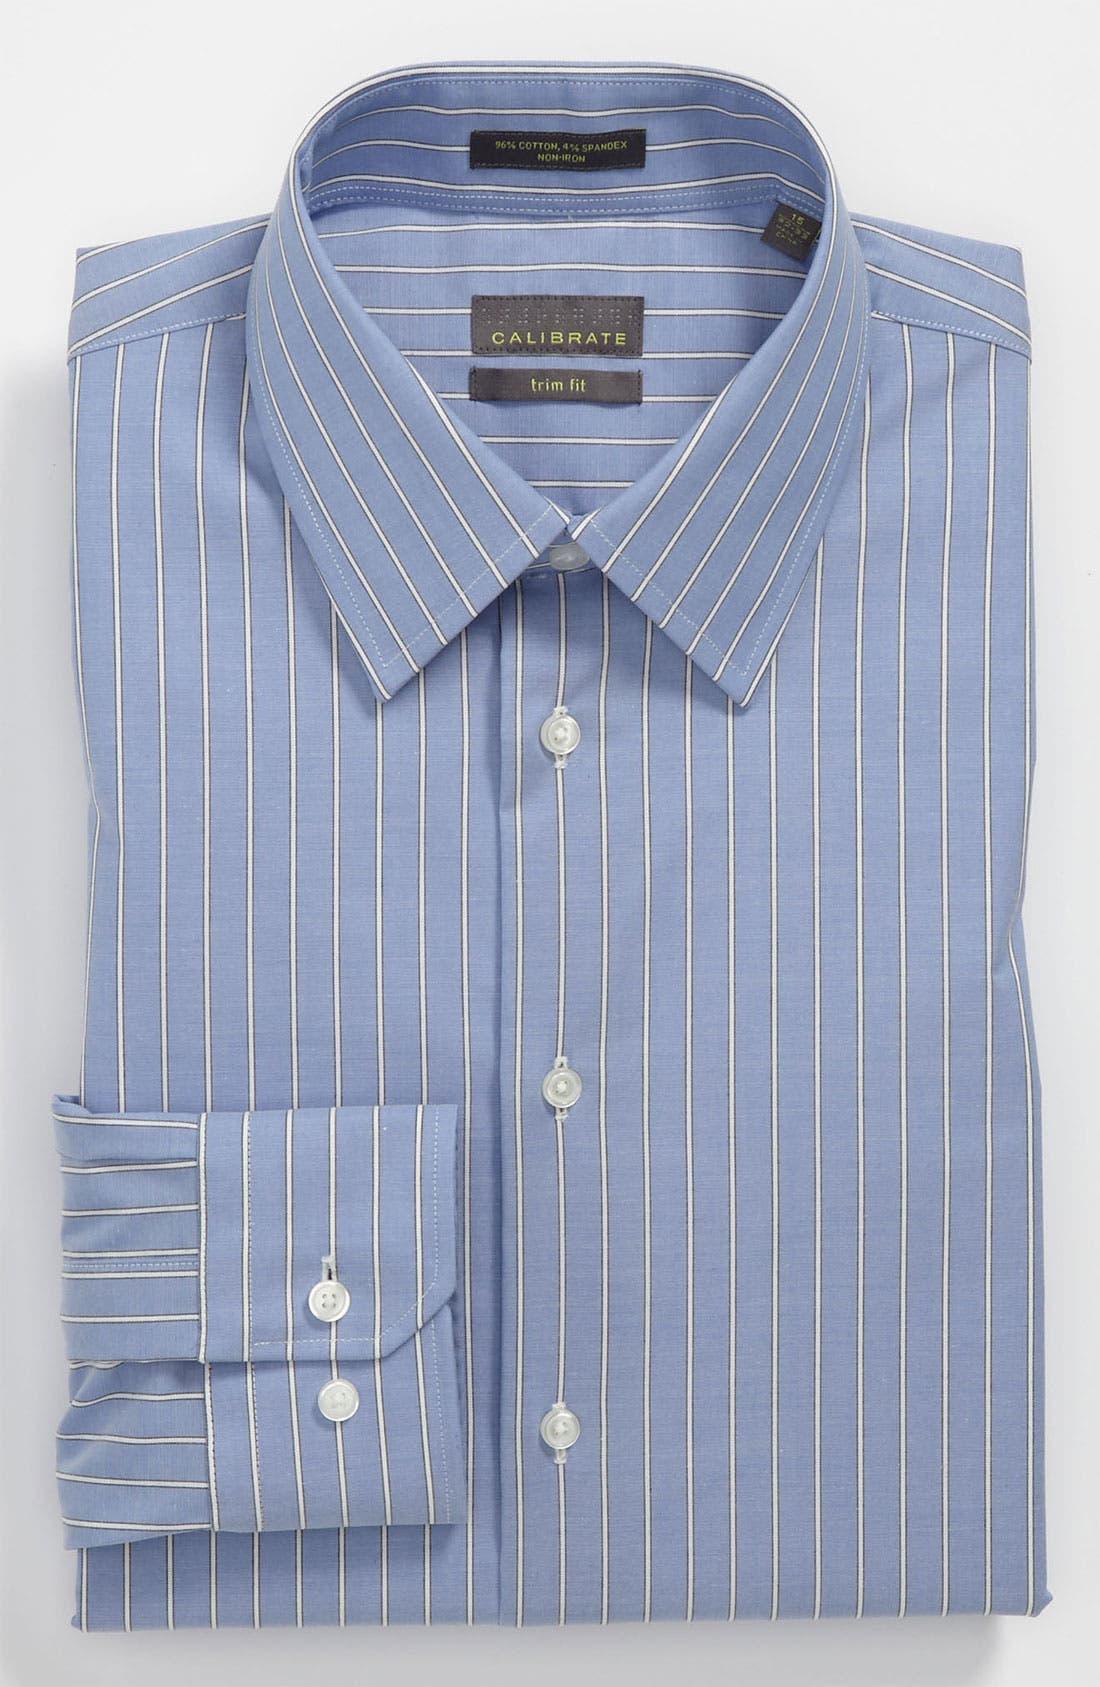 Main Image - Calibrate Trim Fit Non-Iron Dress Shirt